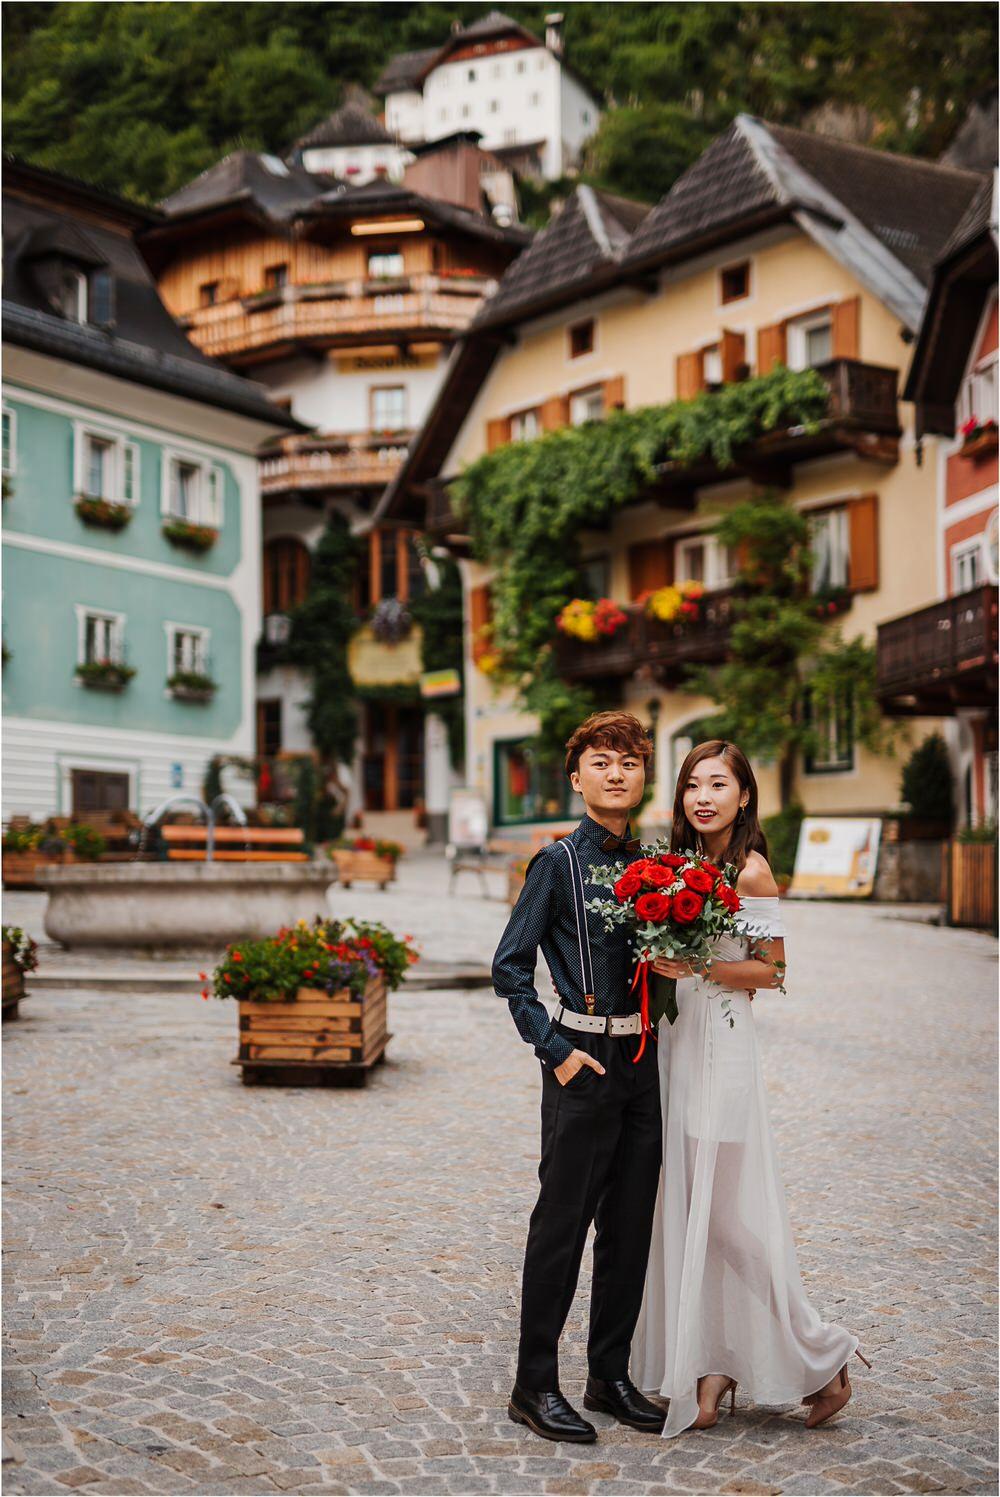 hallstatt austria wedding engagement photographer asian proposal surprise photography recommended nature professional 0009.jpg